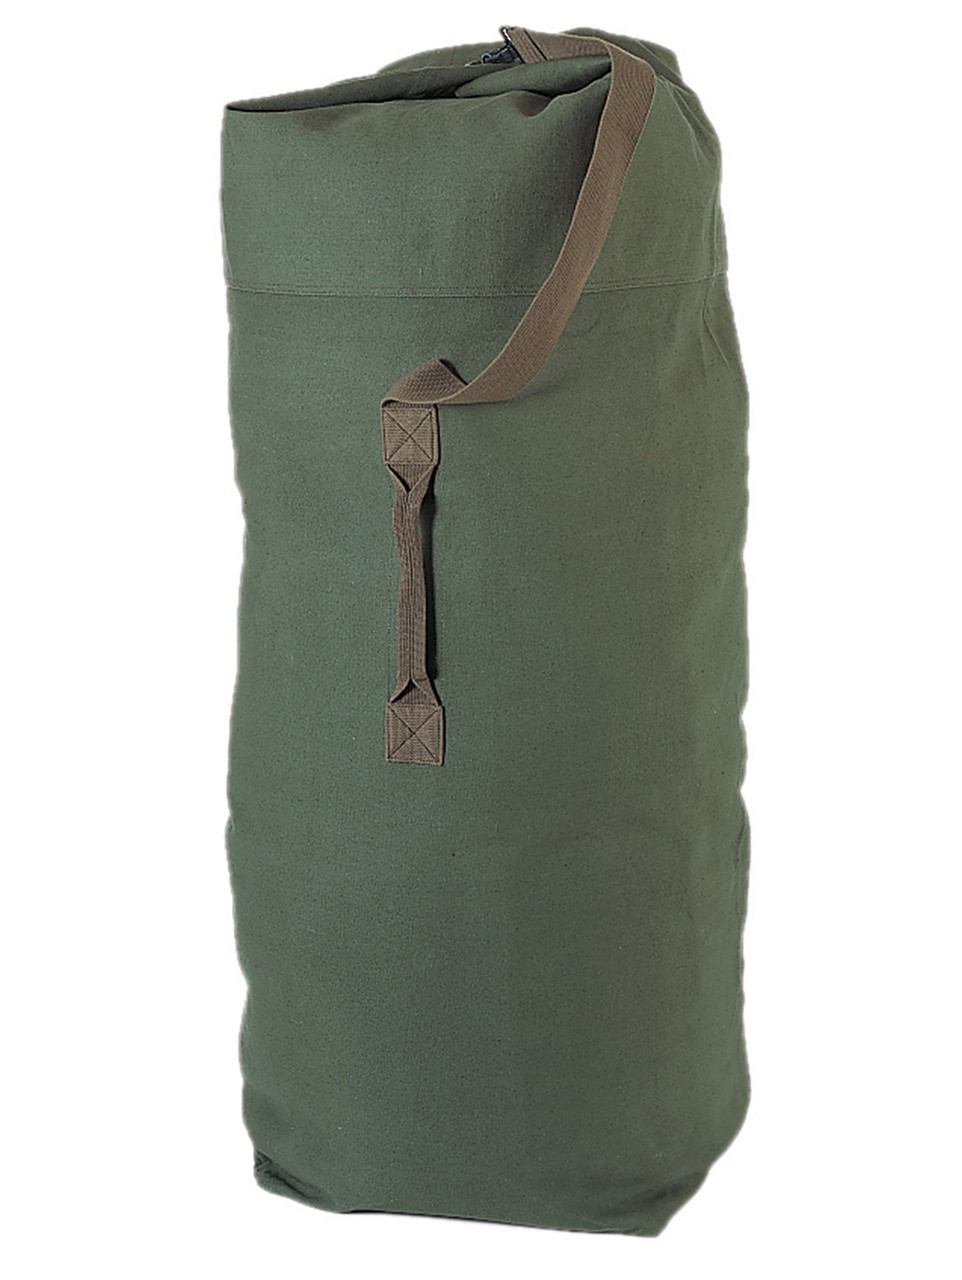 Champion Sports Canvas Duffle Bag